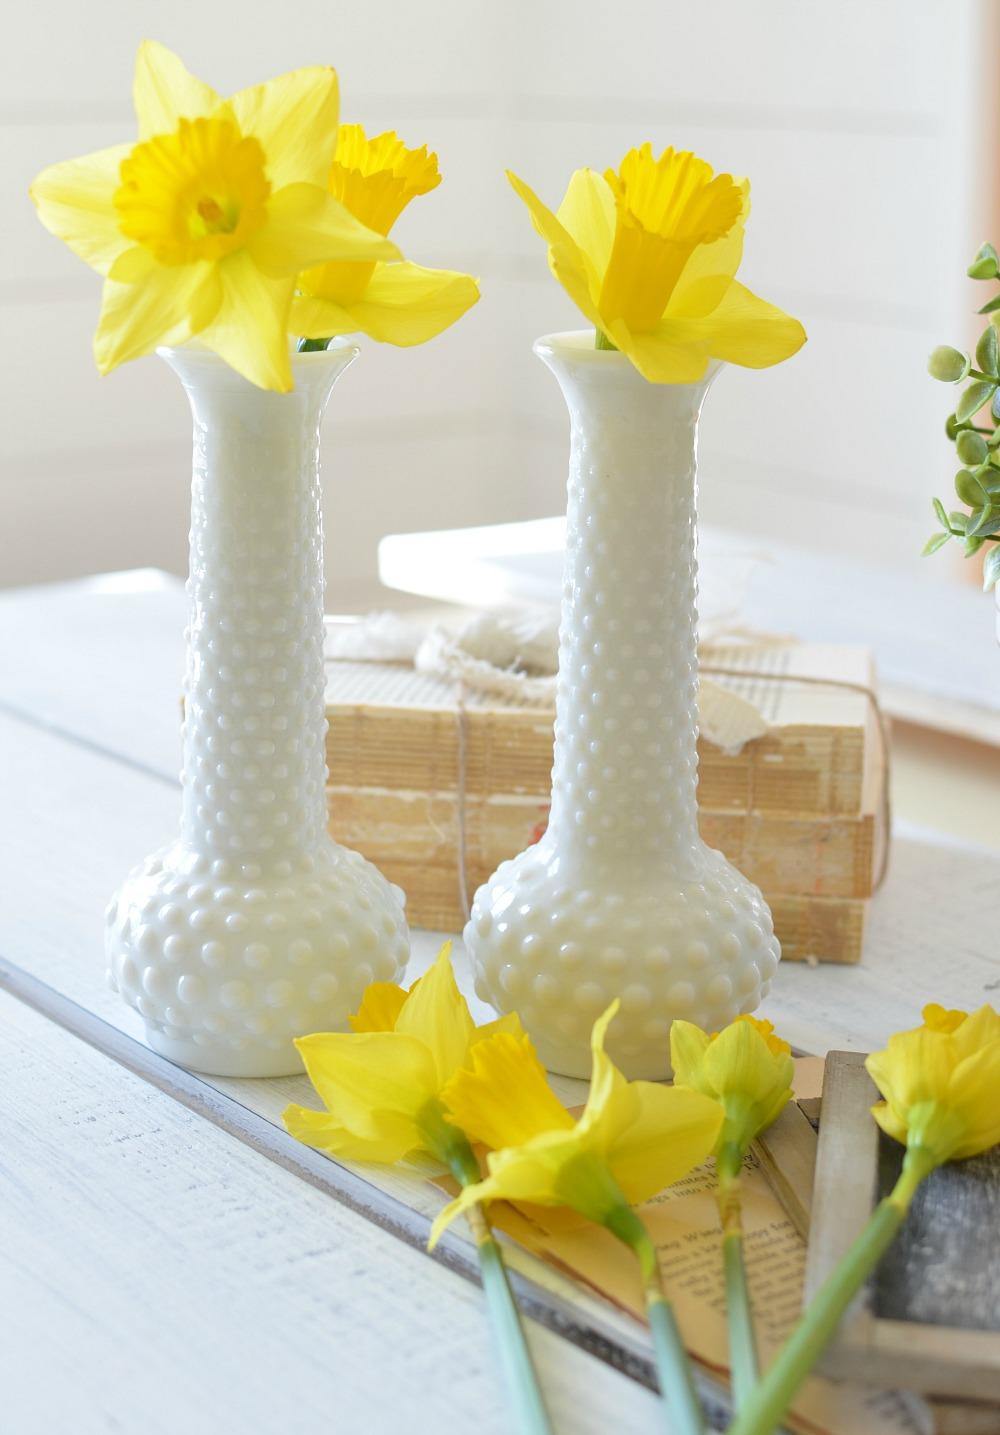 Friday Favorites: White Heirloom Vases from Magnolia Market